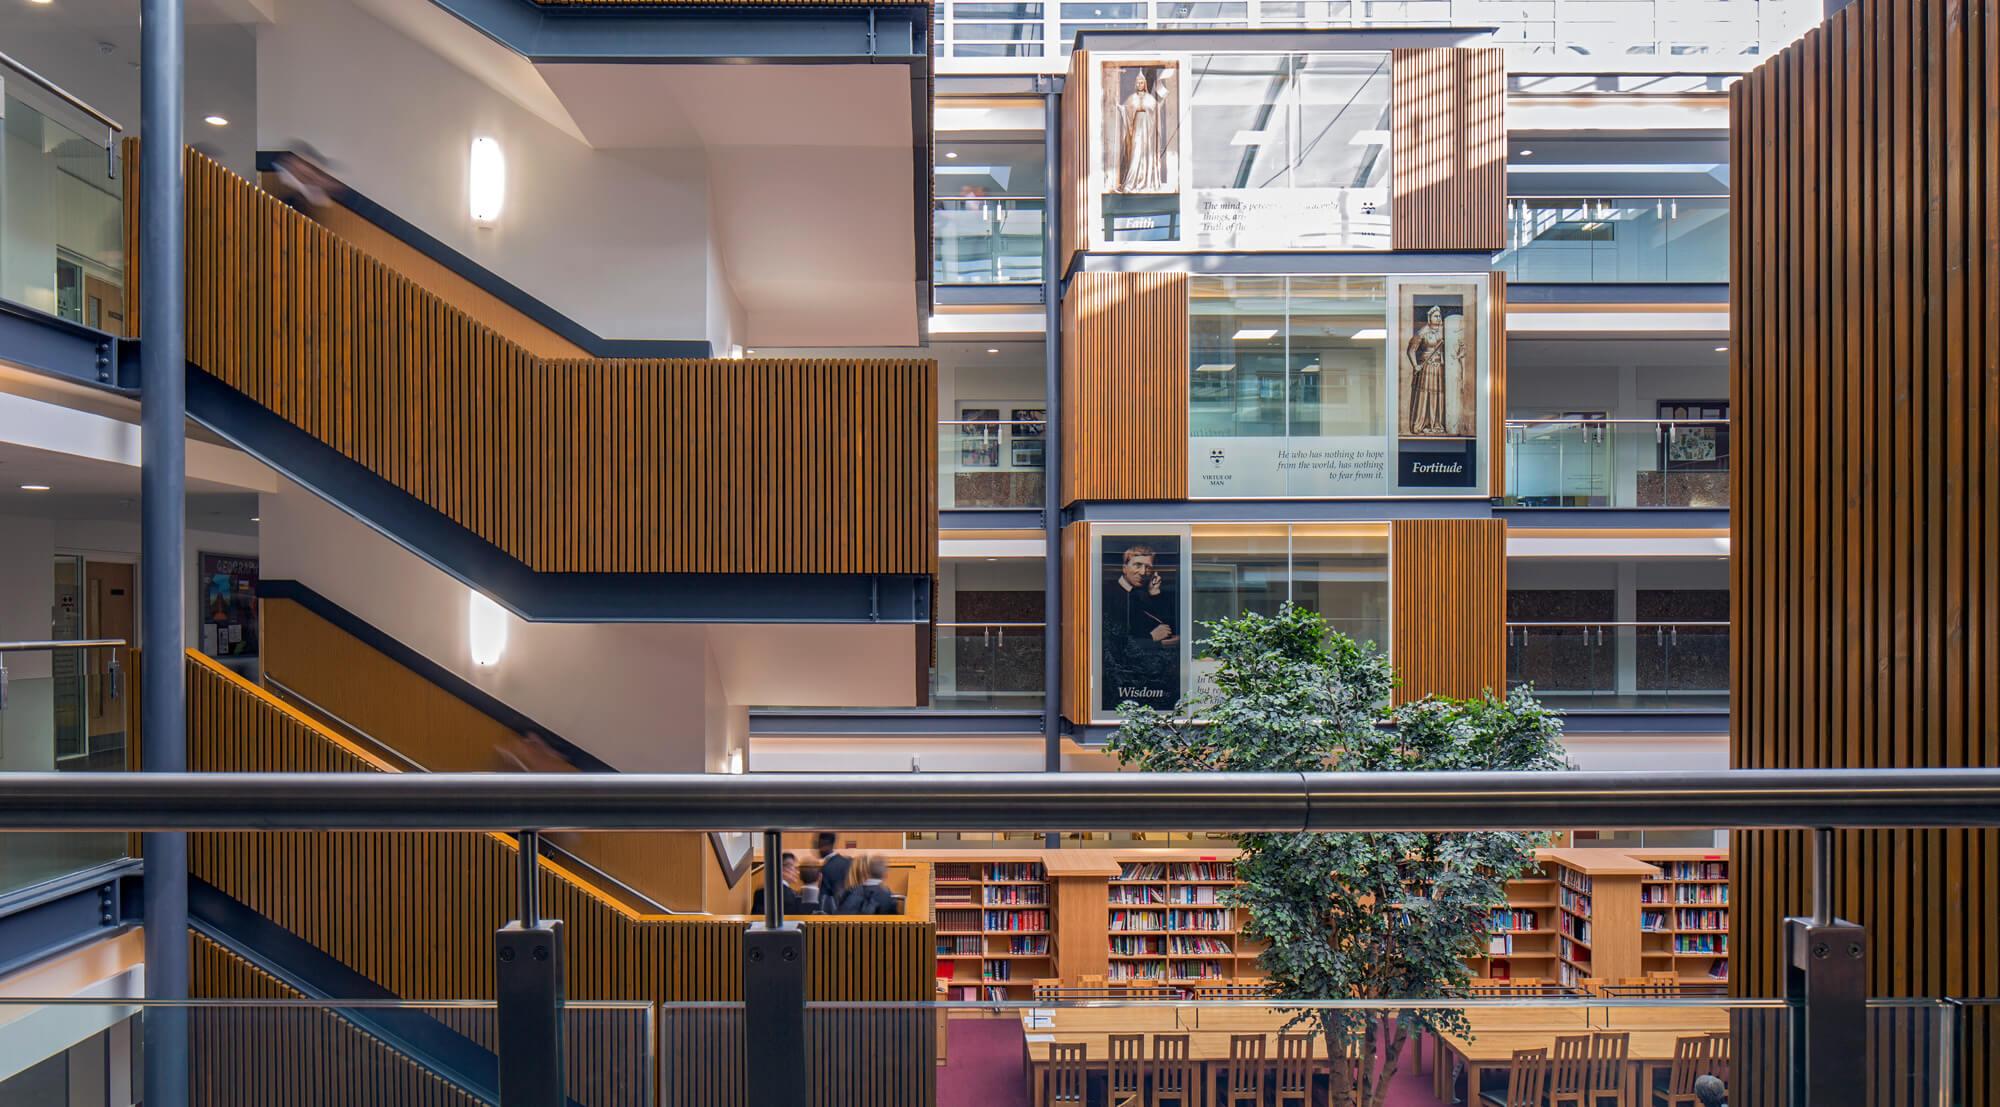 london_oratory_school_window_graphics_banner_02.jpg